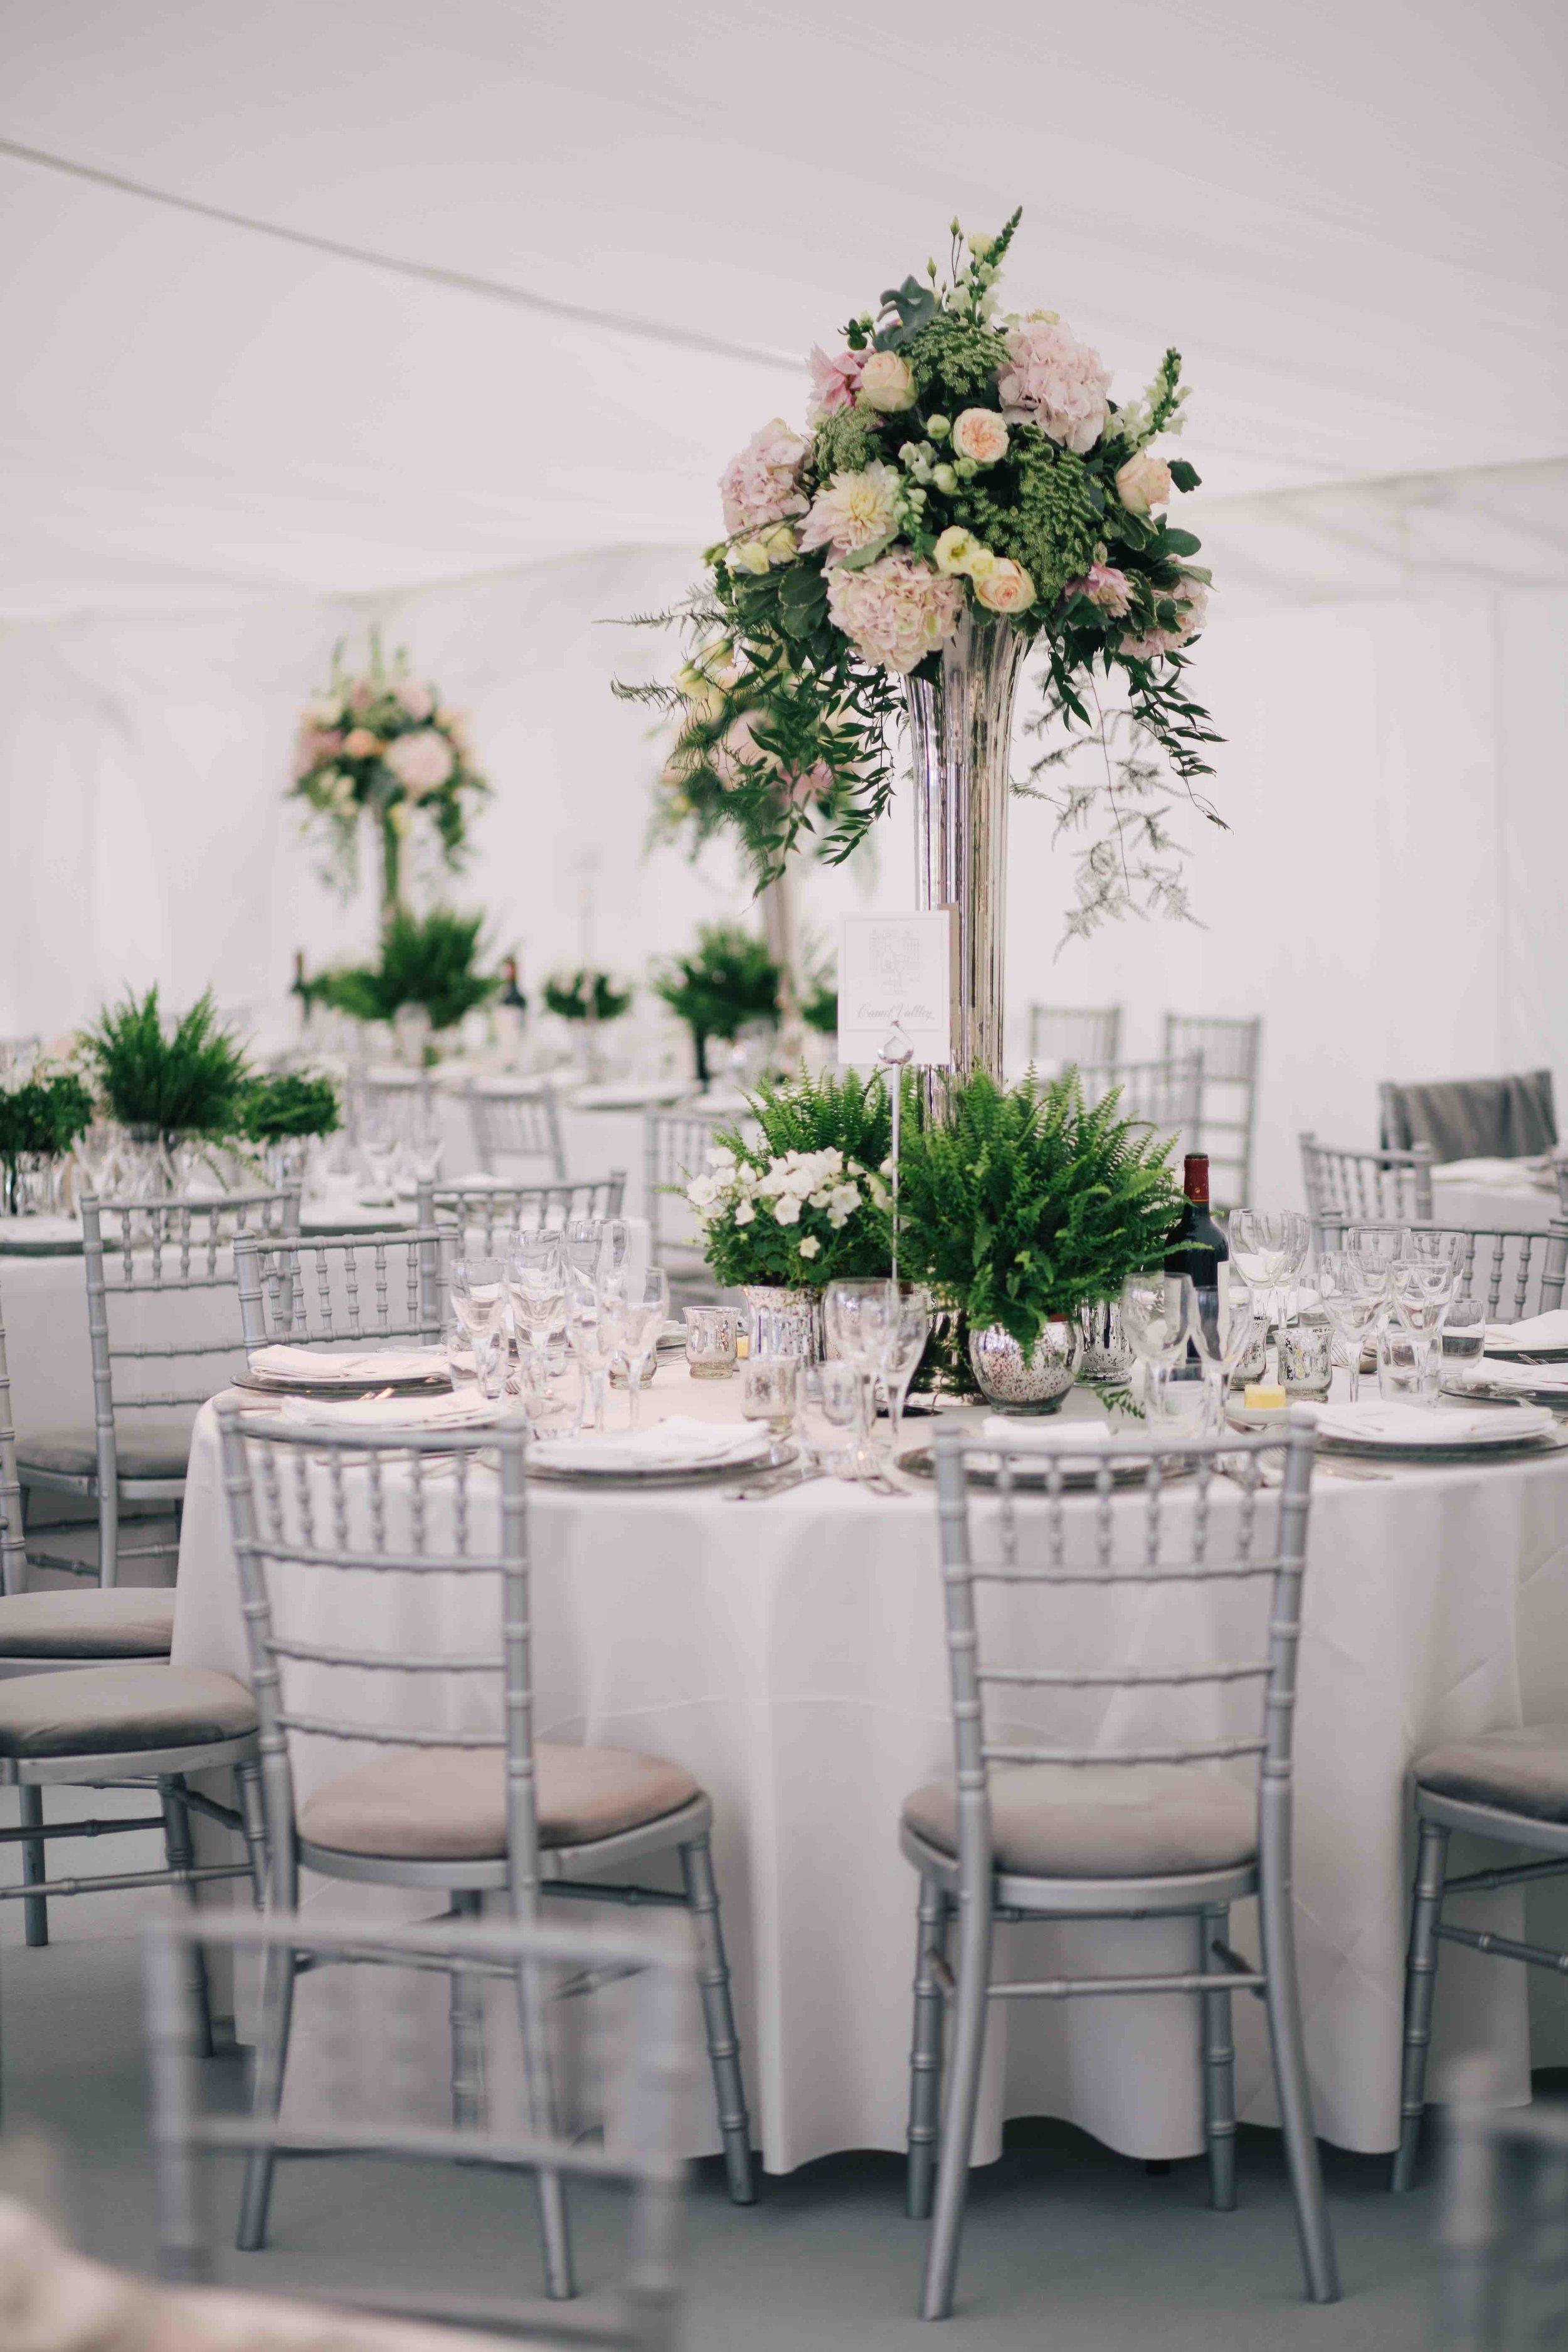 Littleton-Rose-Botanical-Wedding-Cornwall-Wedding-Planners-Floral-Table-Centres.jpg